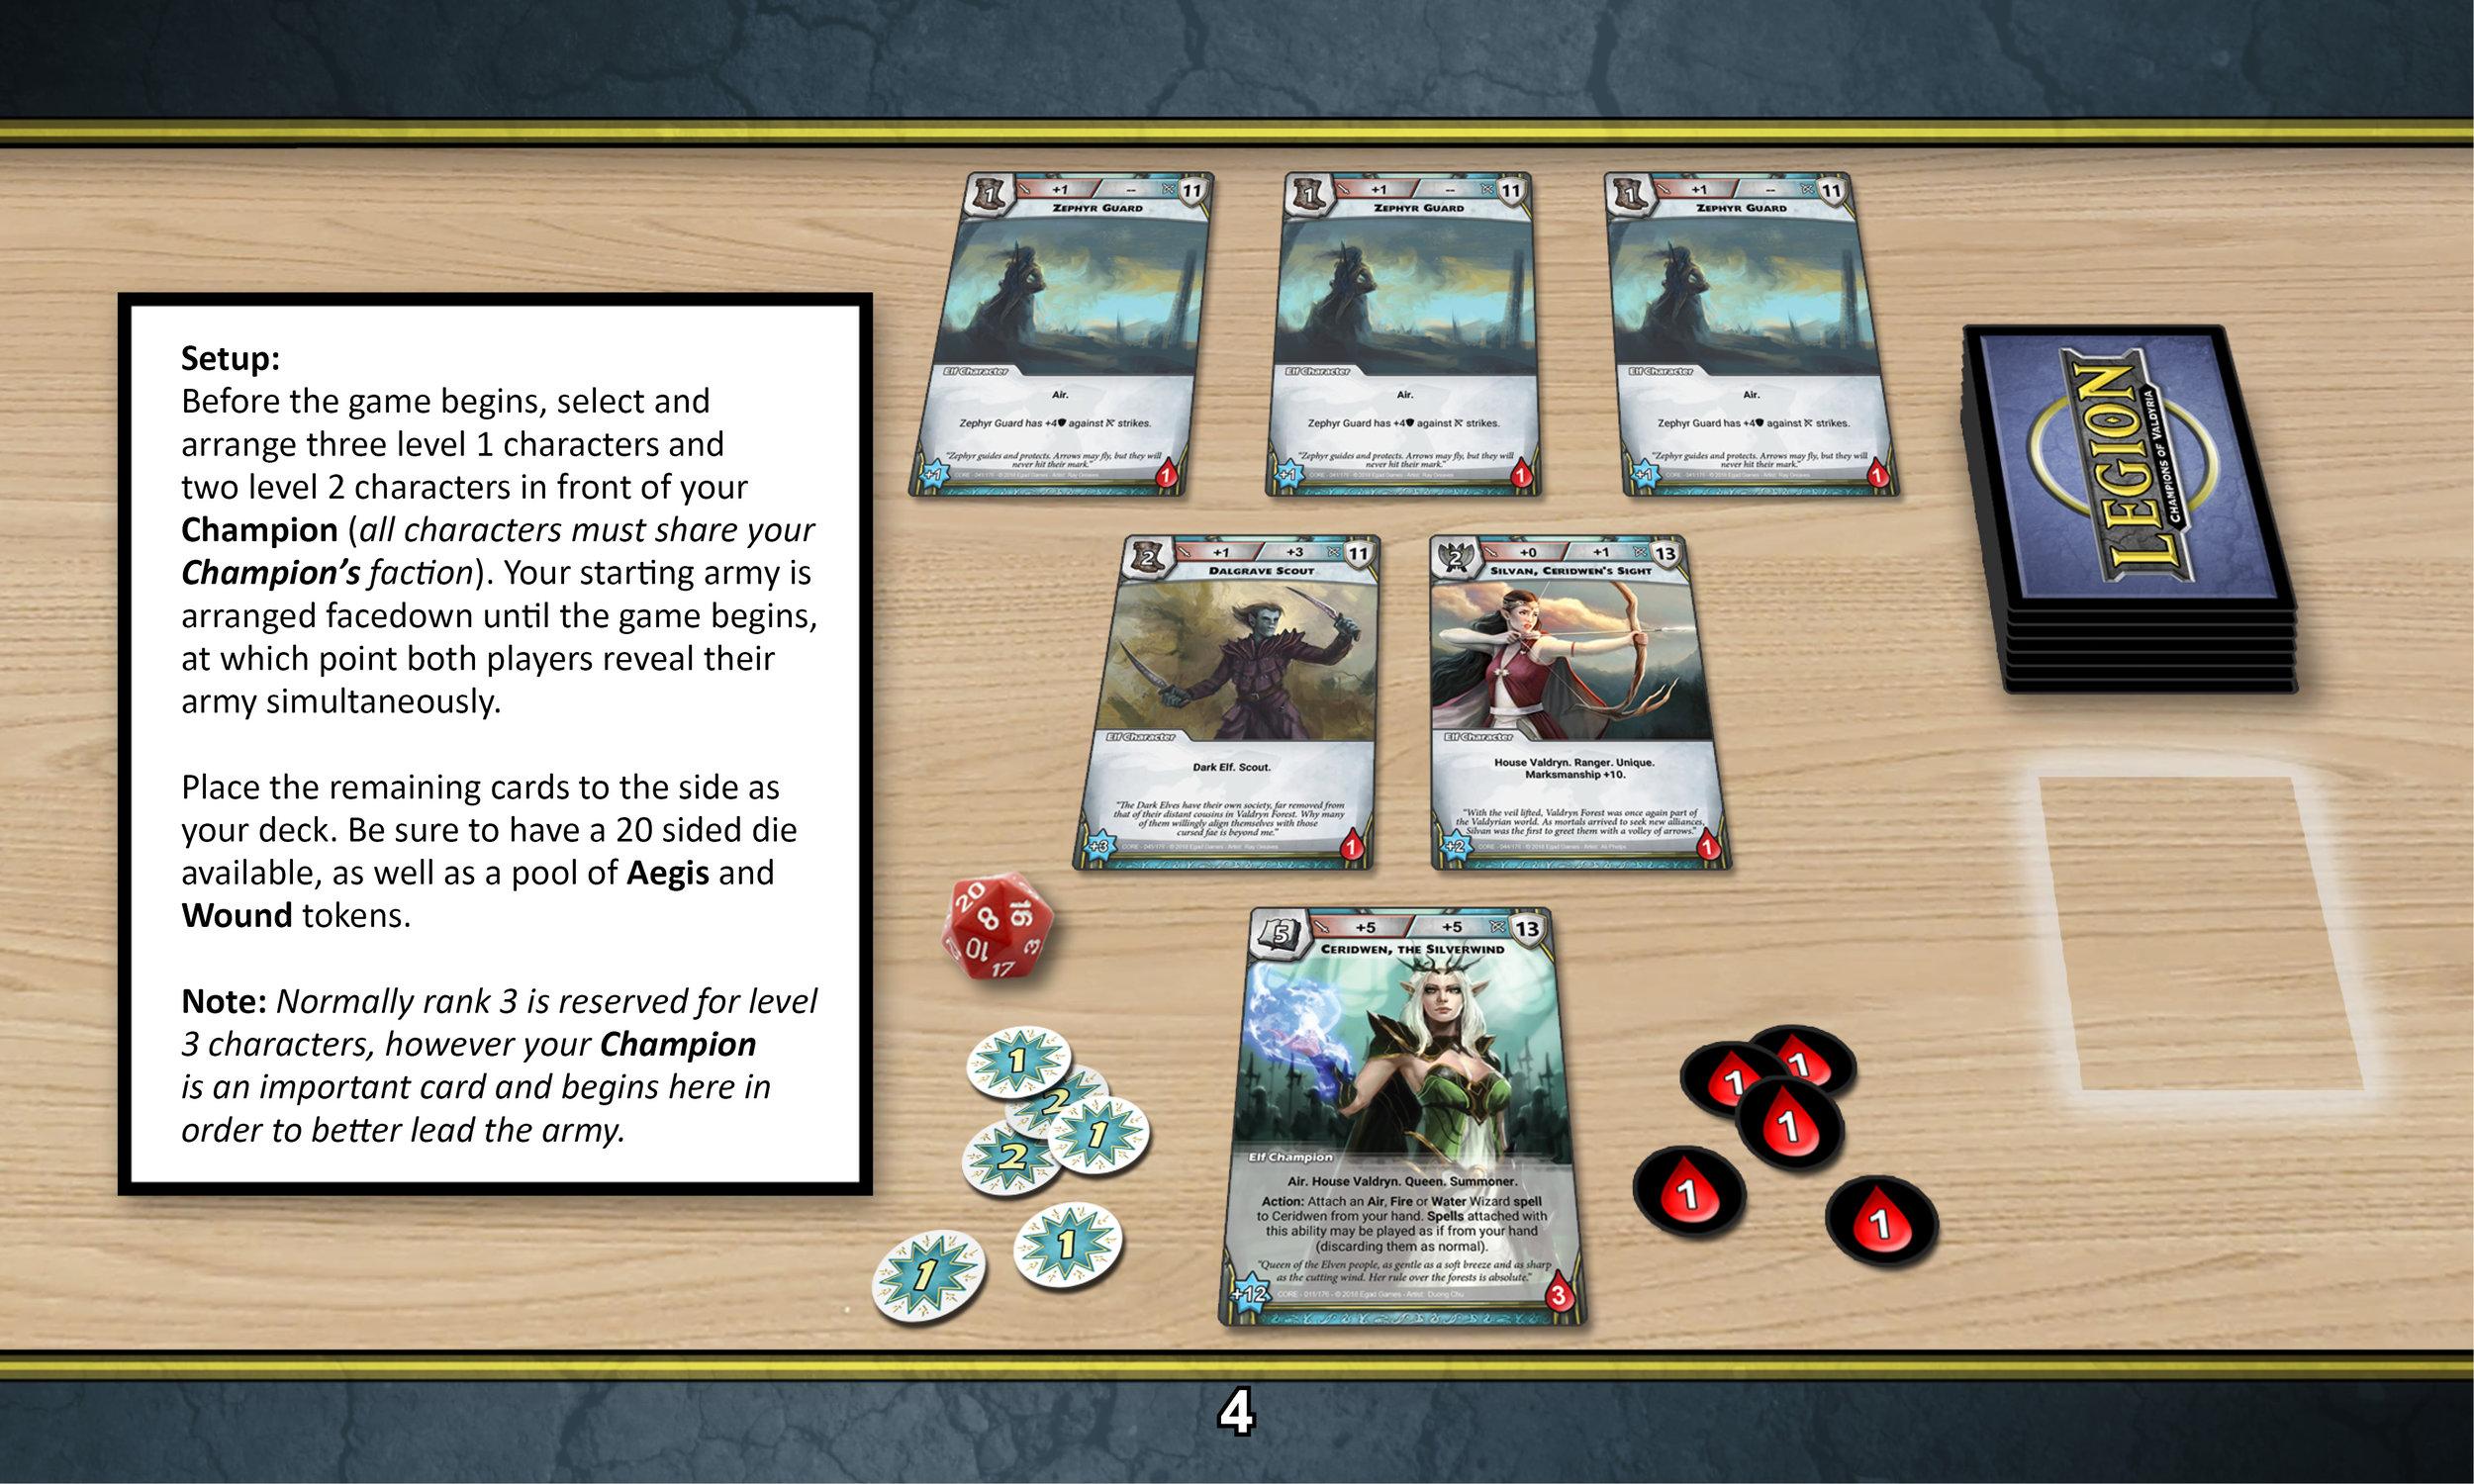 Legion_Learn_to_Play4.jpg